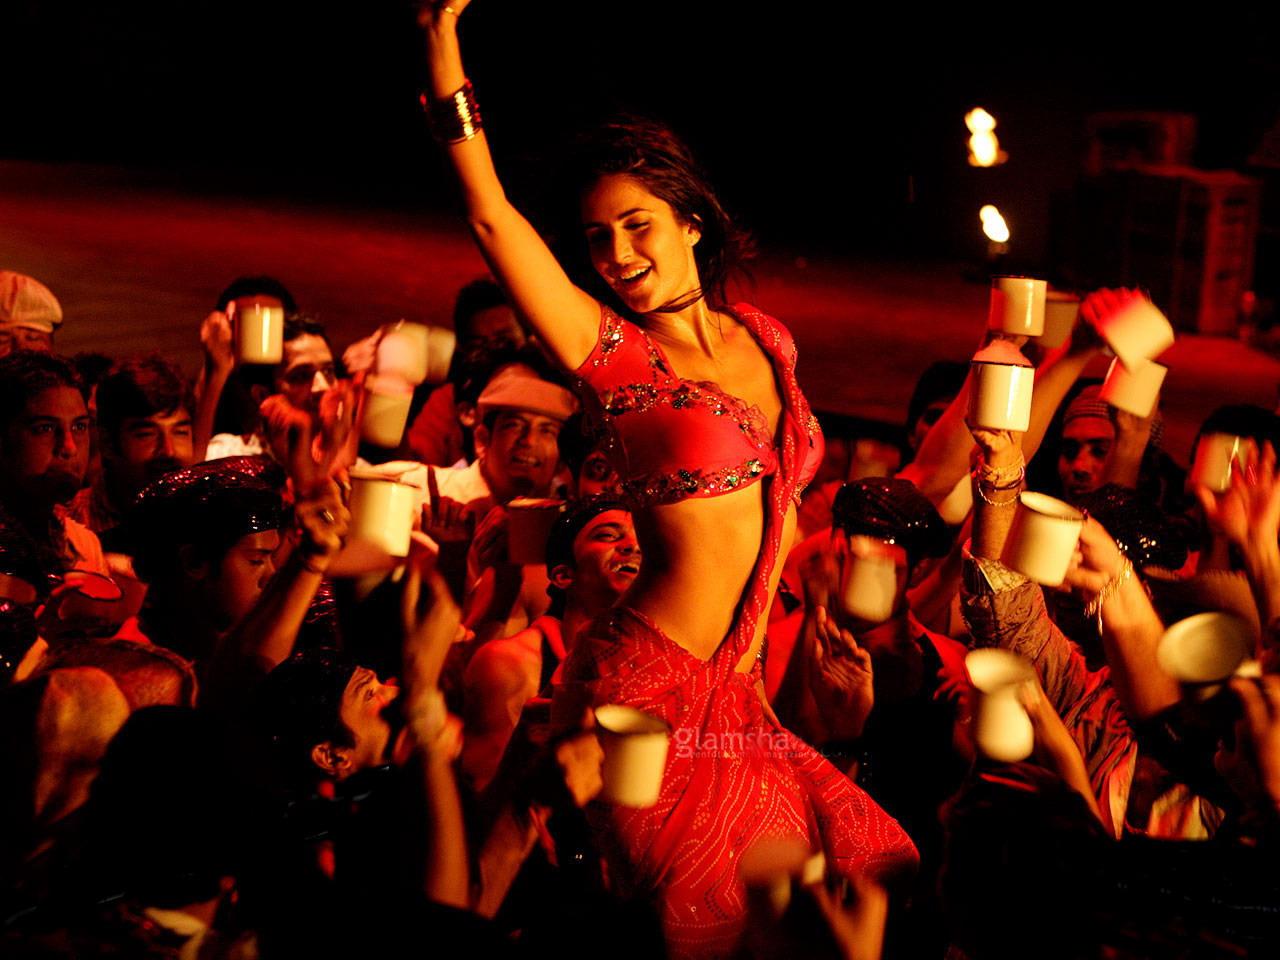 http://2.bp.blogspot.com/-YeBVNUhDAGU/TdmHDRiDiAI/AAAAAAAAAZ0/40TC2USYLmw/s1600/Katrina+Kaif+Wallpaper3.jpg